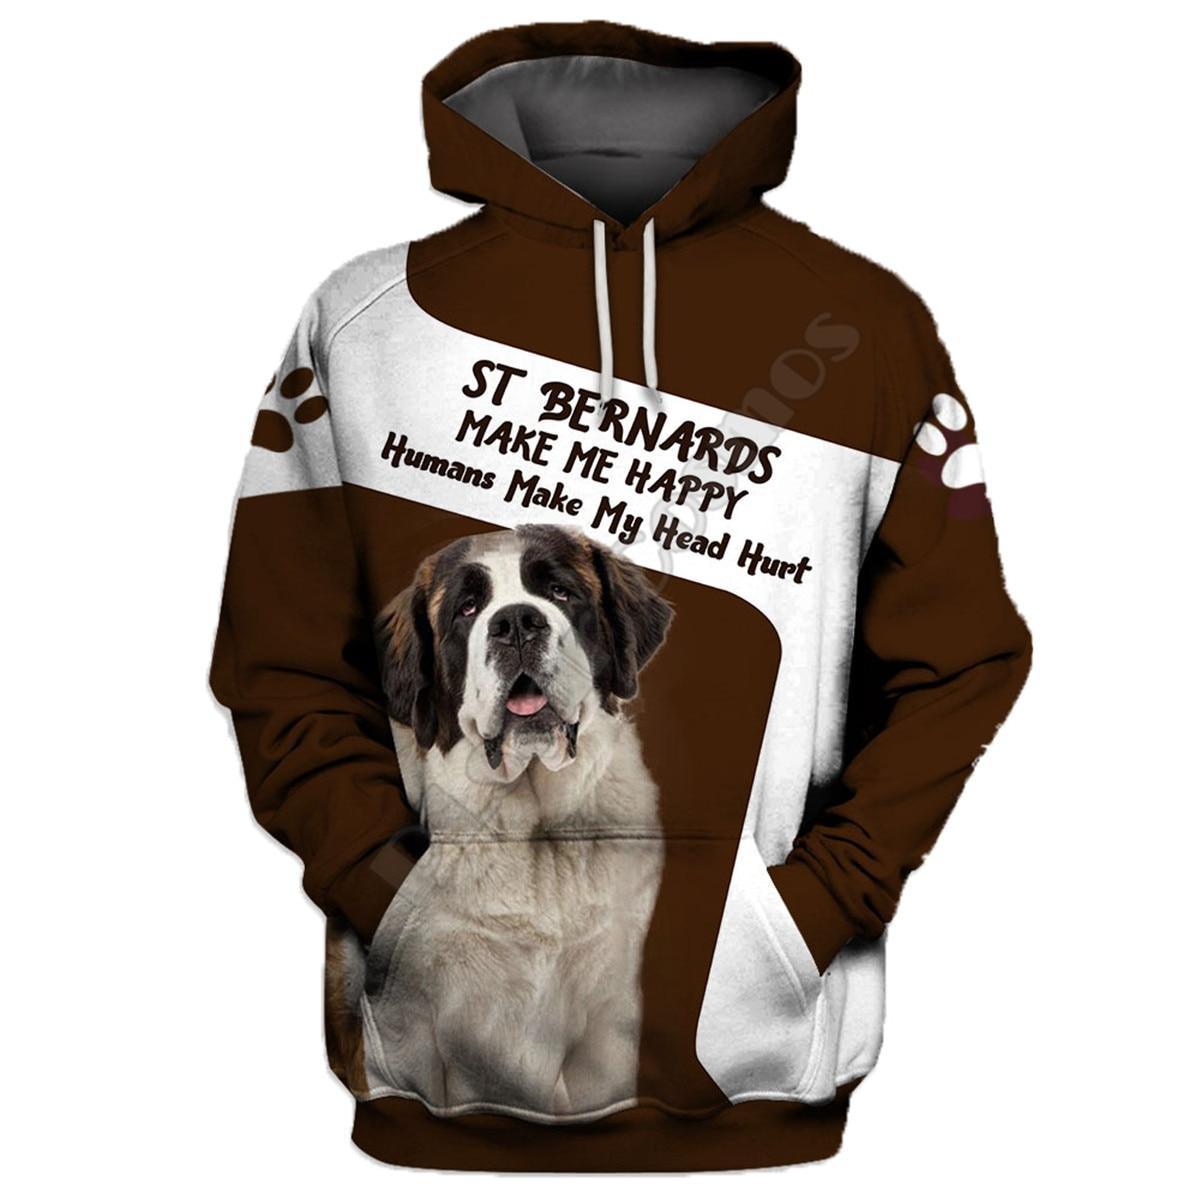 St Bernards 3D Hoodies Printed Pullover Men For Women Funny Sweatshirts Sweater Animal Hoodies Drop Shipping 22